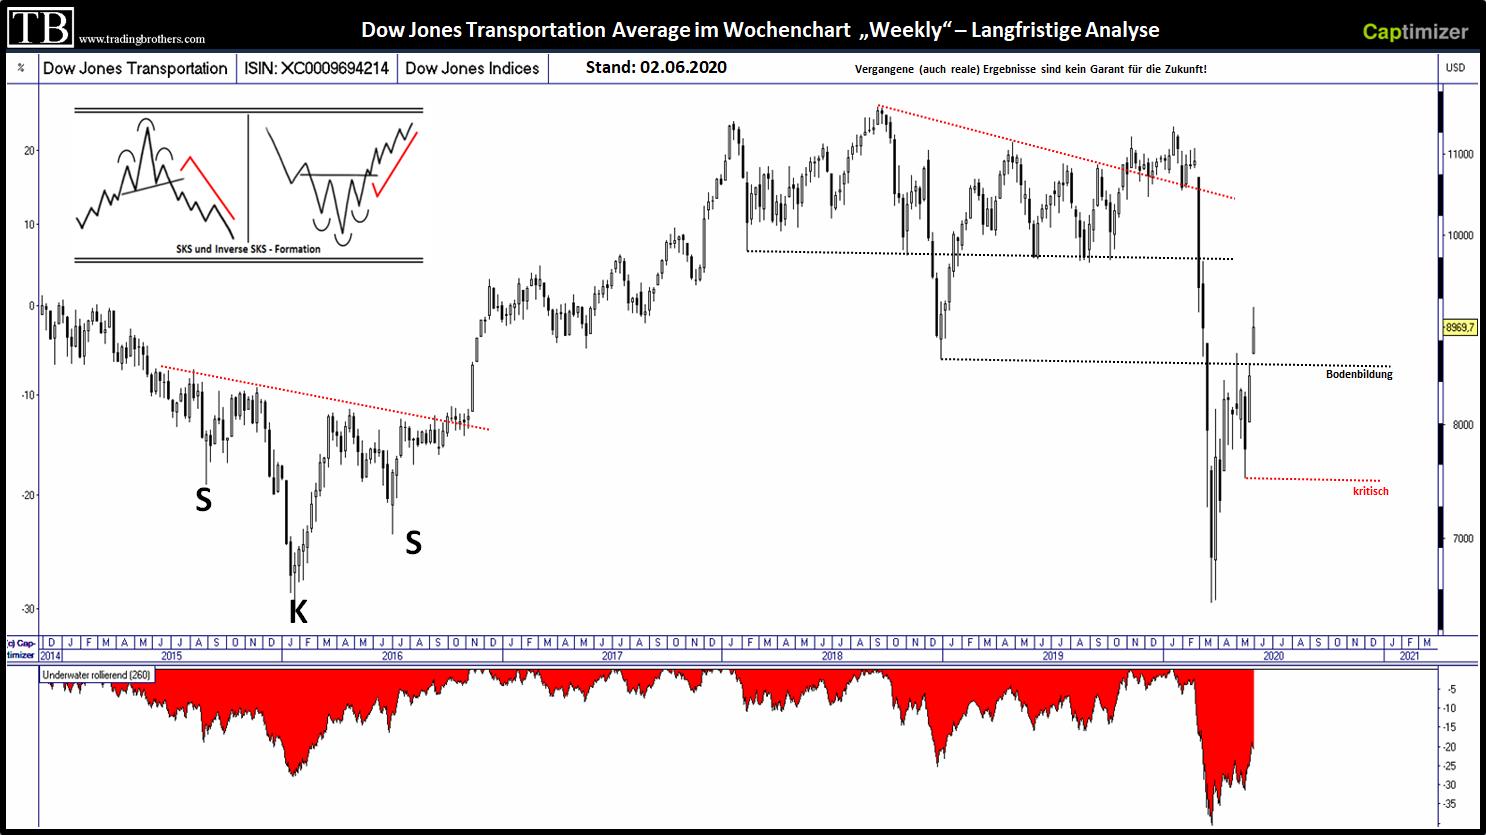 Dow Jones Transportation Chartanalyse